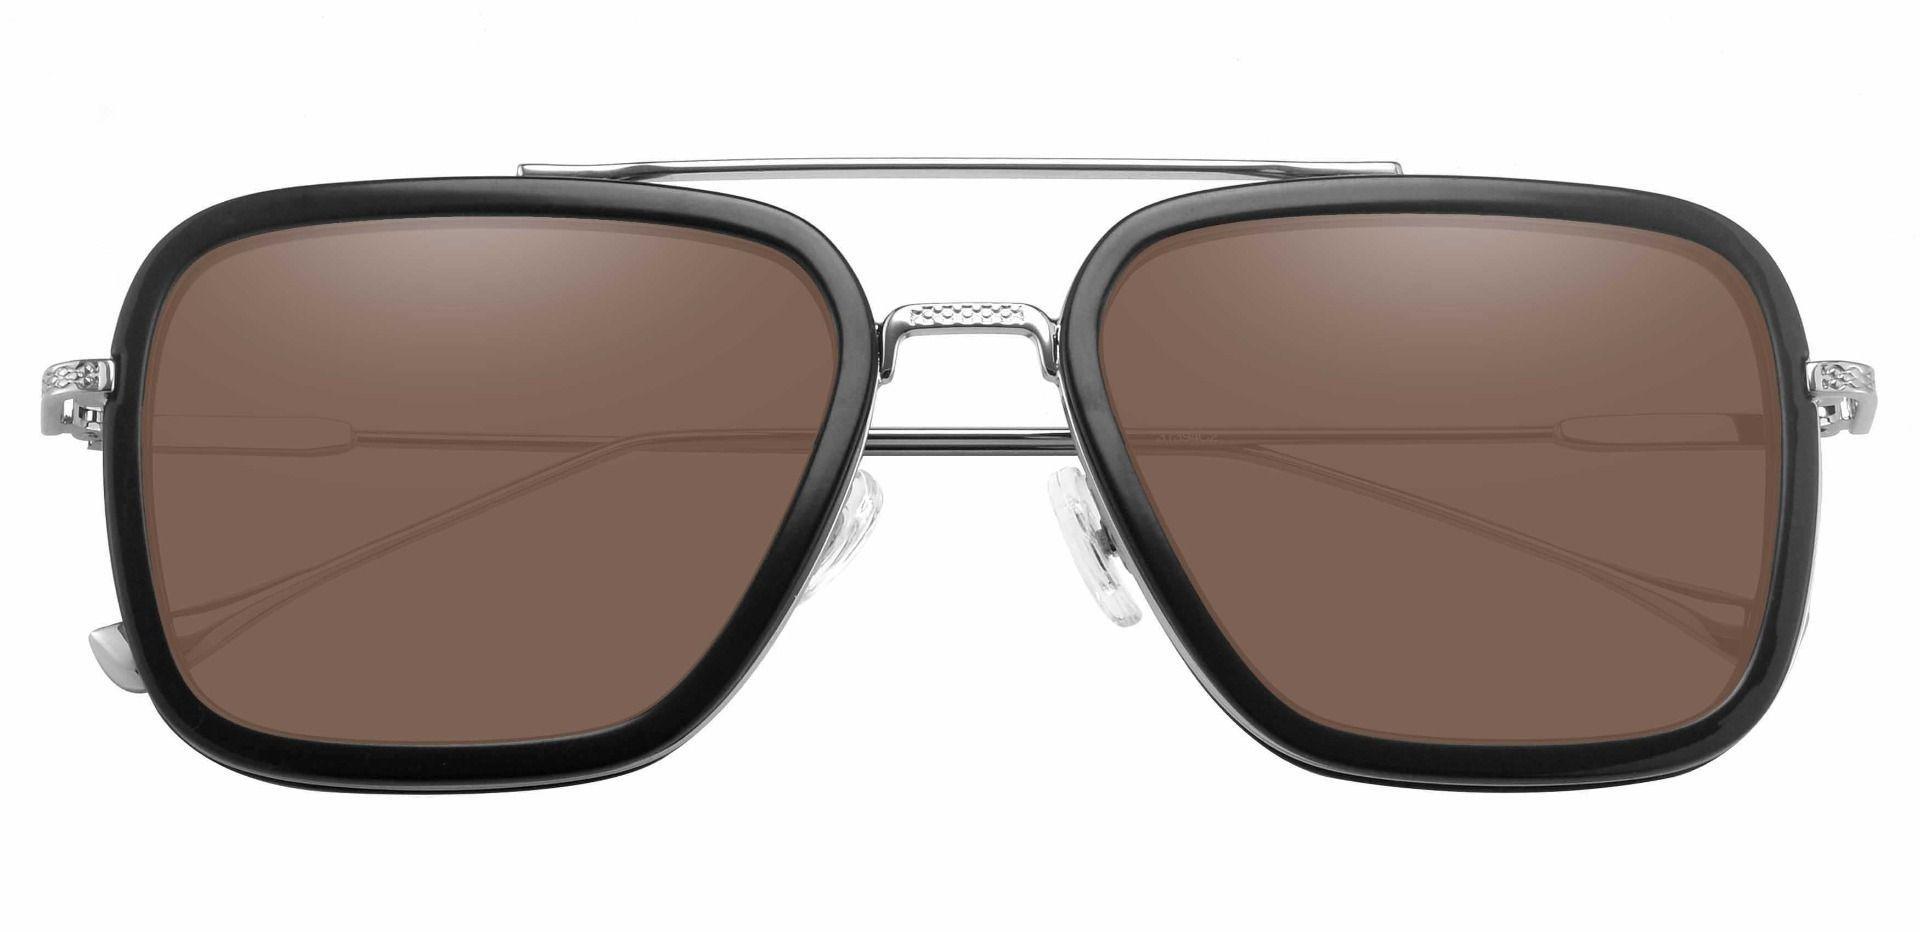 Cruz Aviator Lined Bifocal Sunglasses - Black Frame With Brown Lenses